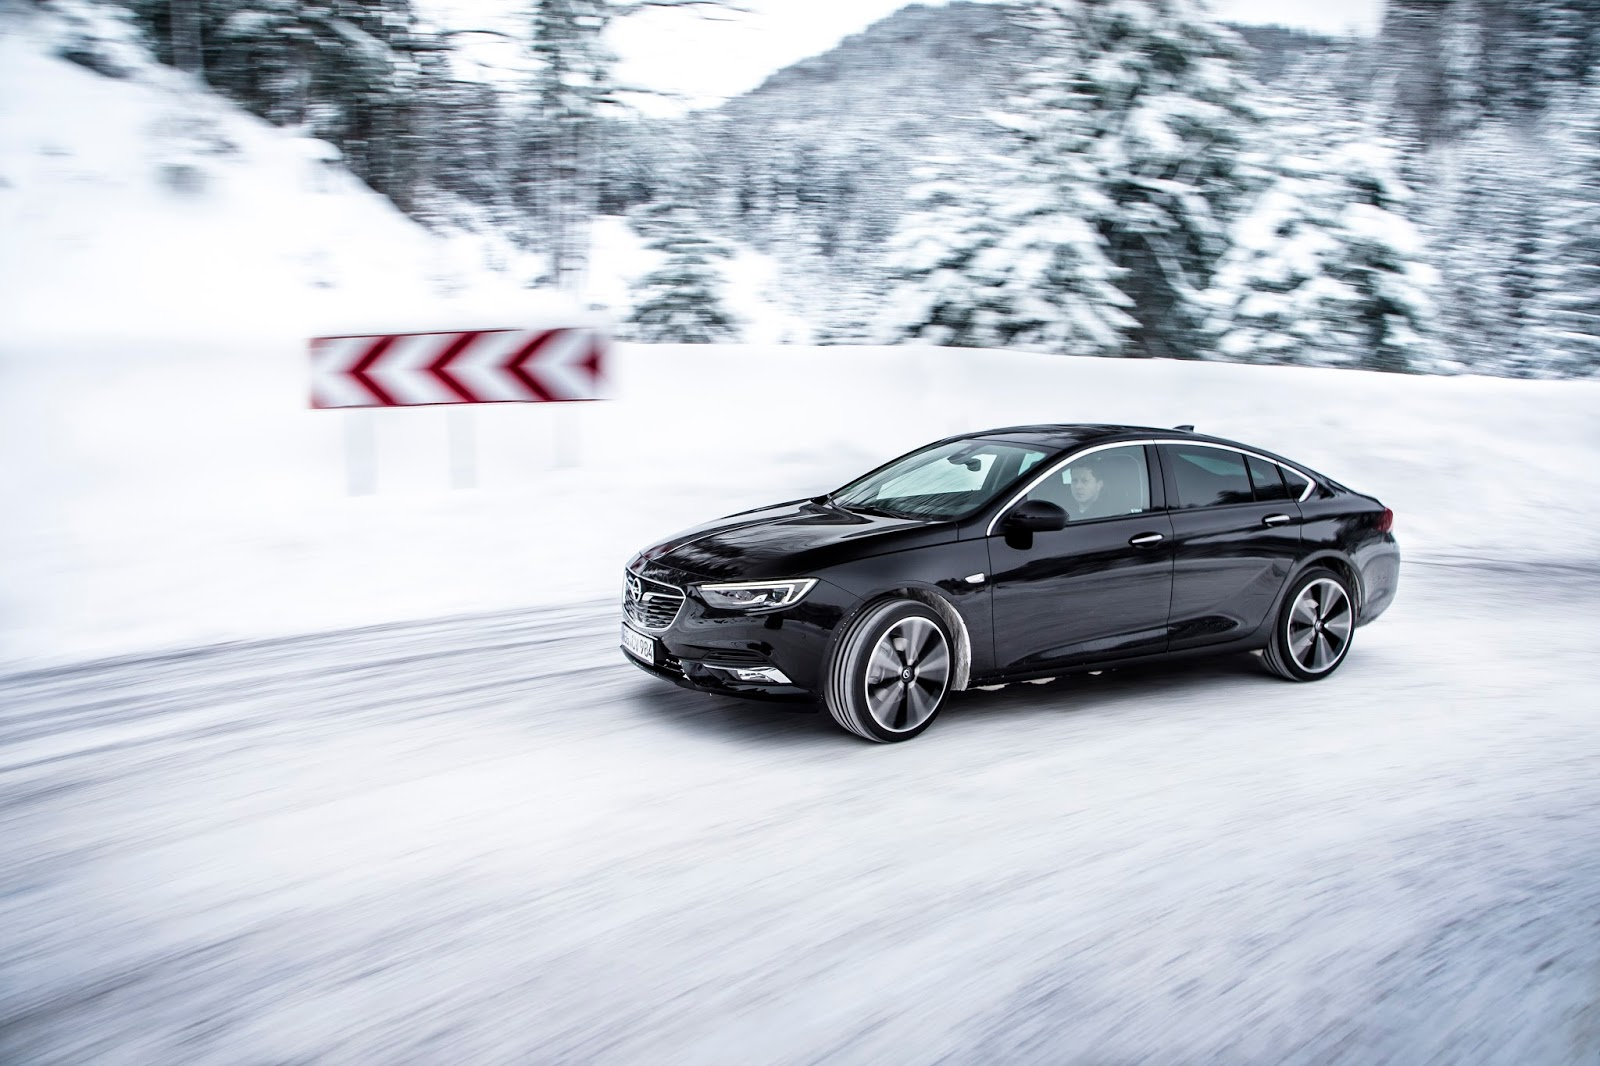 Opel Insignia Grand Sport 3049122B252812529 1